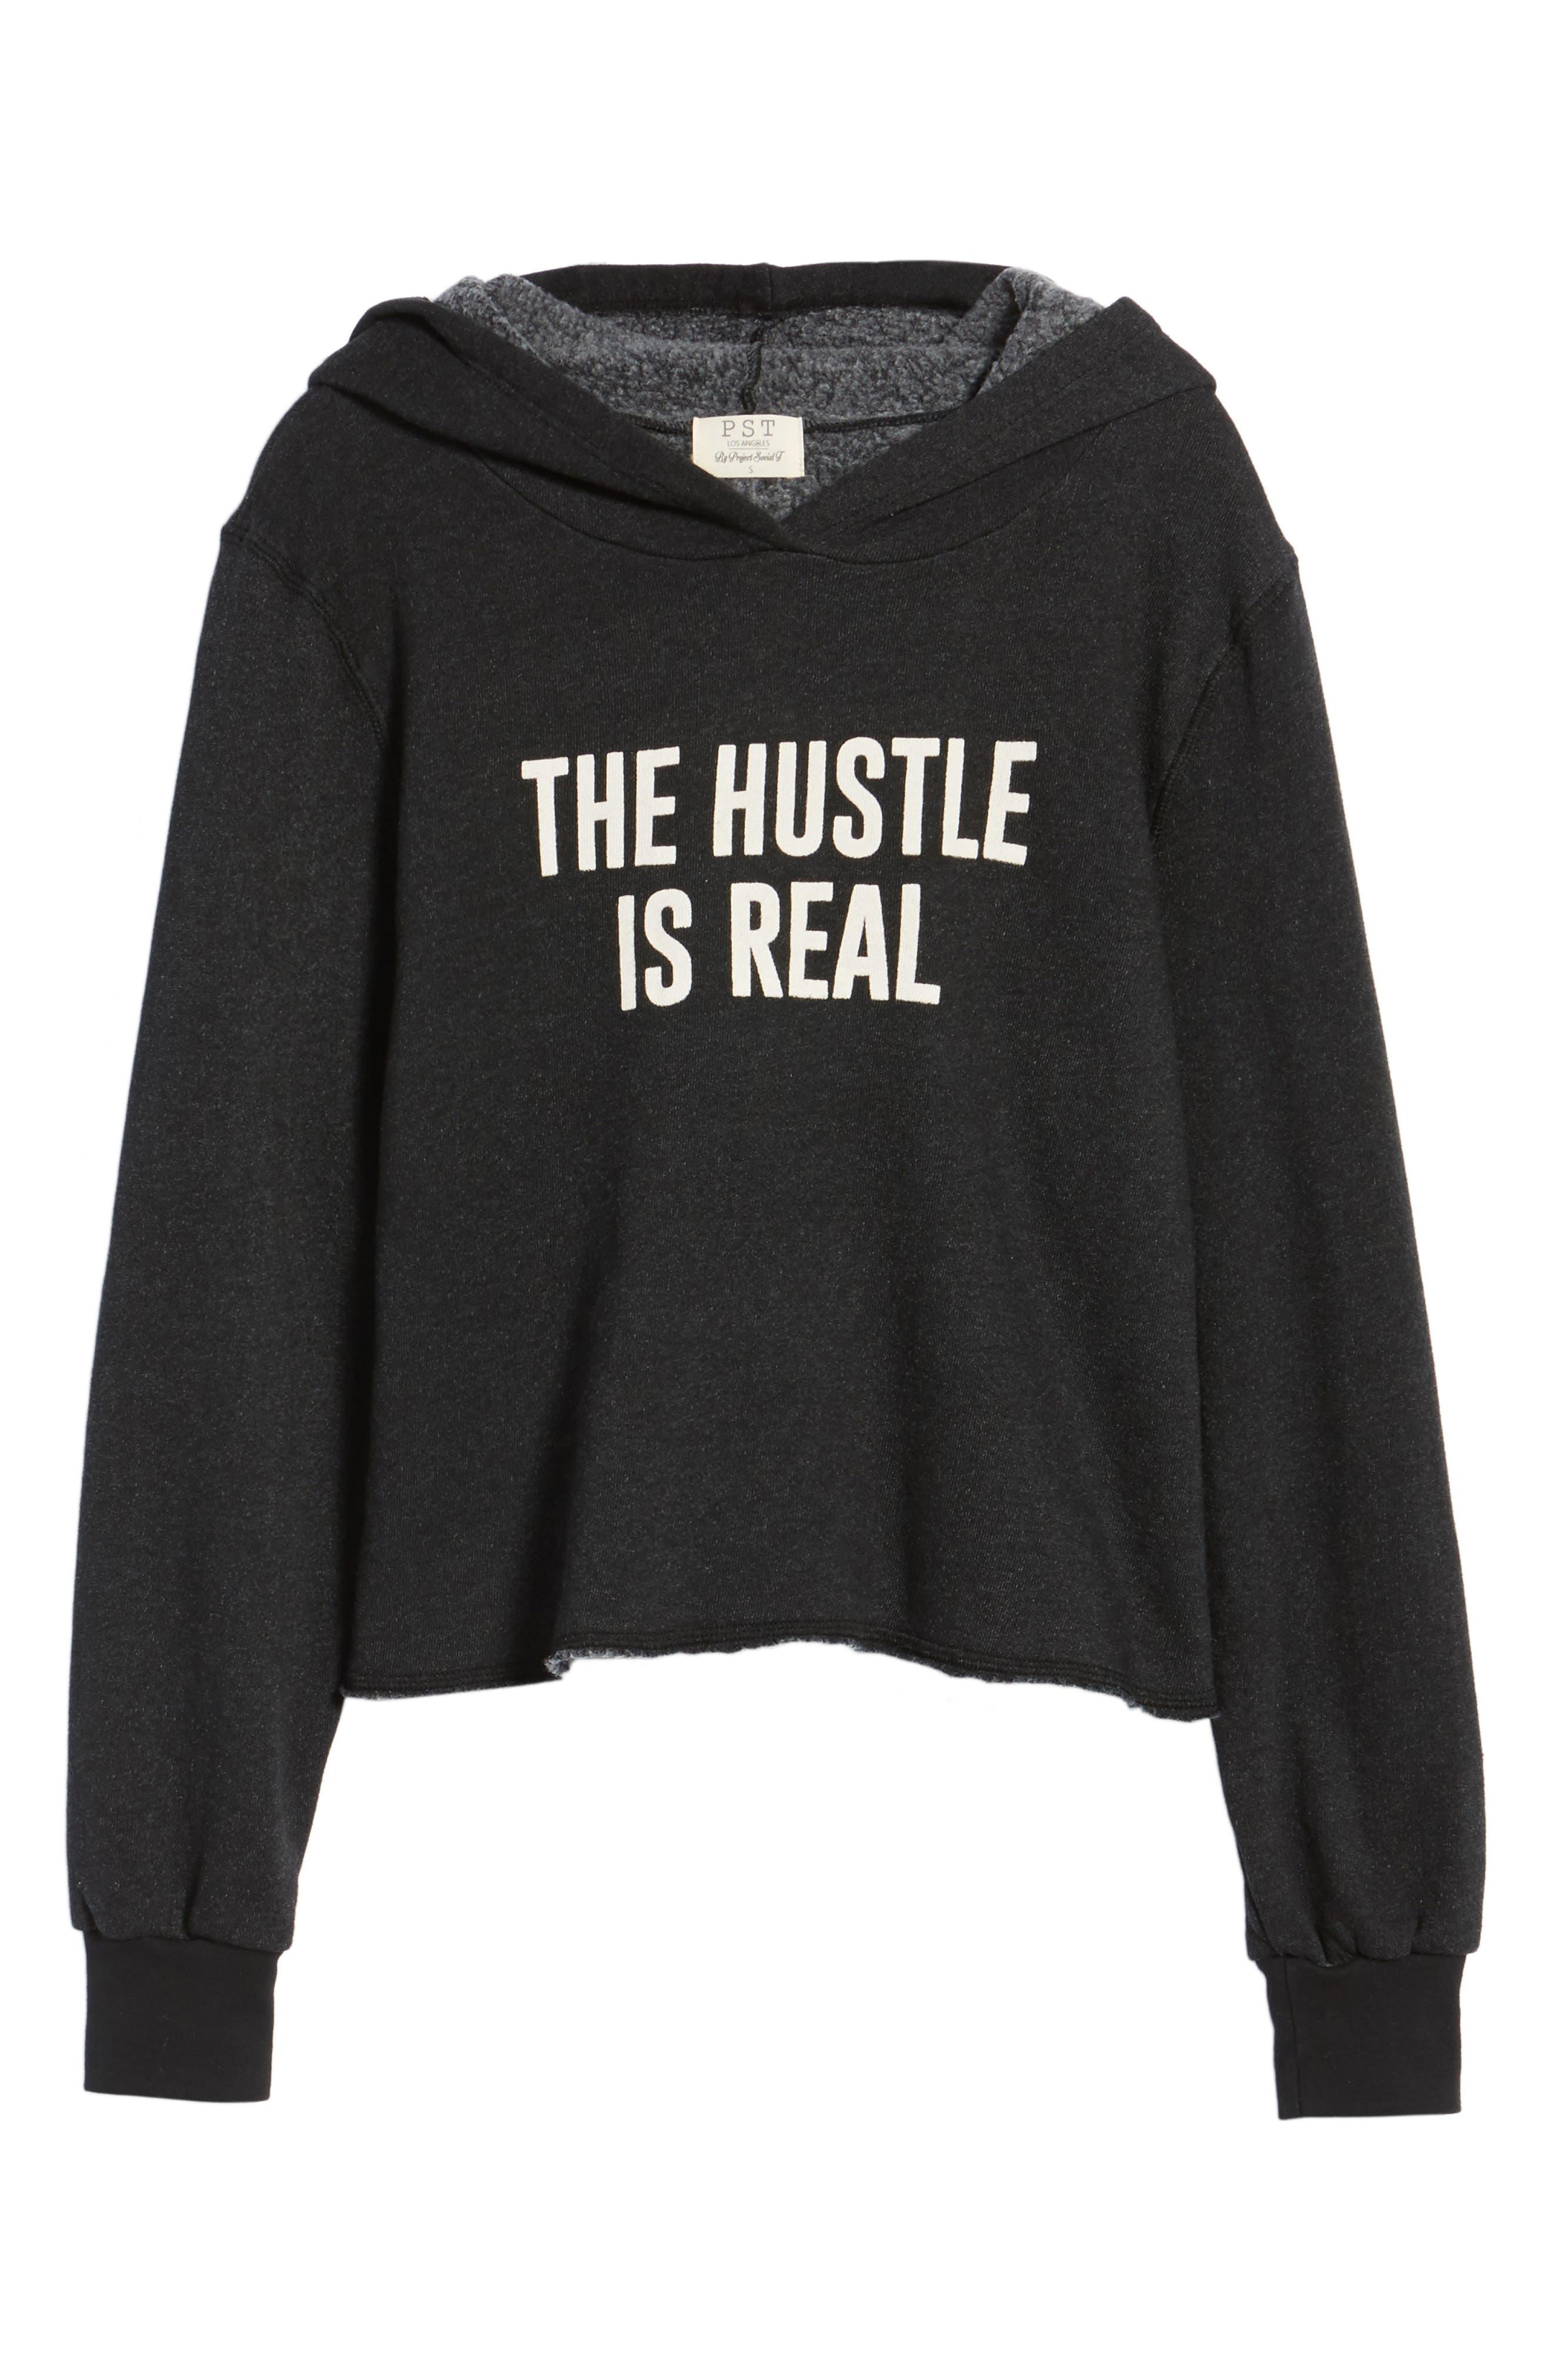 The Hustle is Real Hoodie,                             Alternate thumbnail 6, color,                             Black